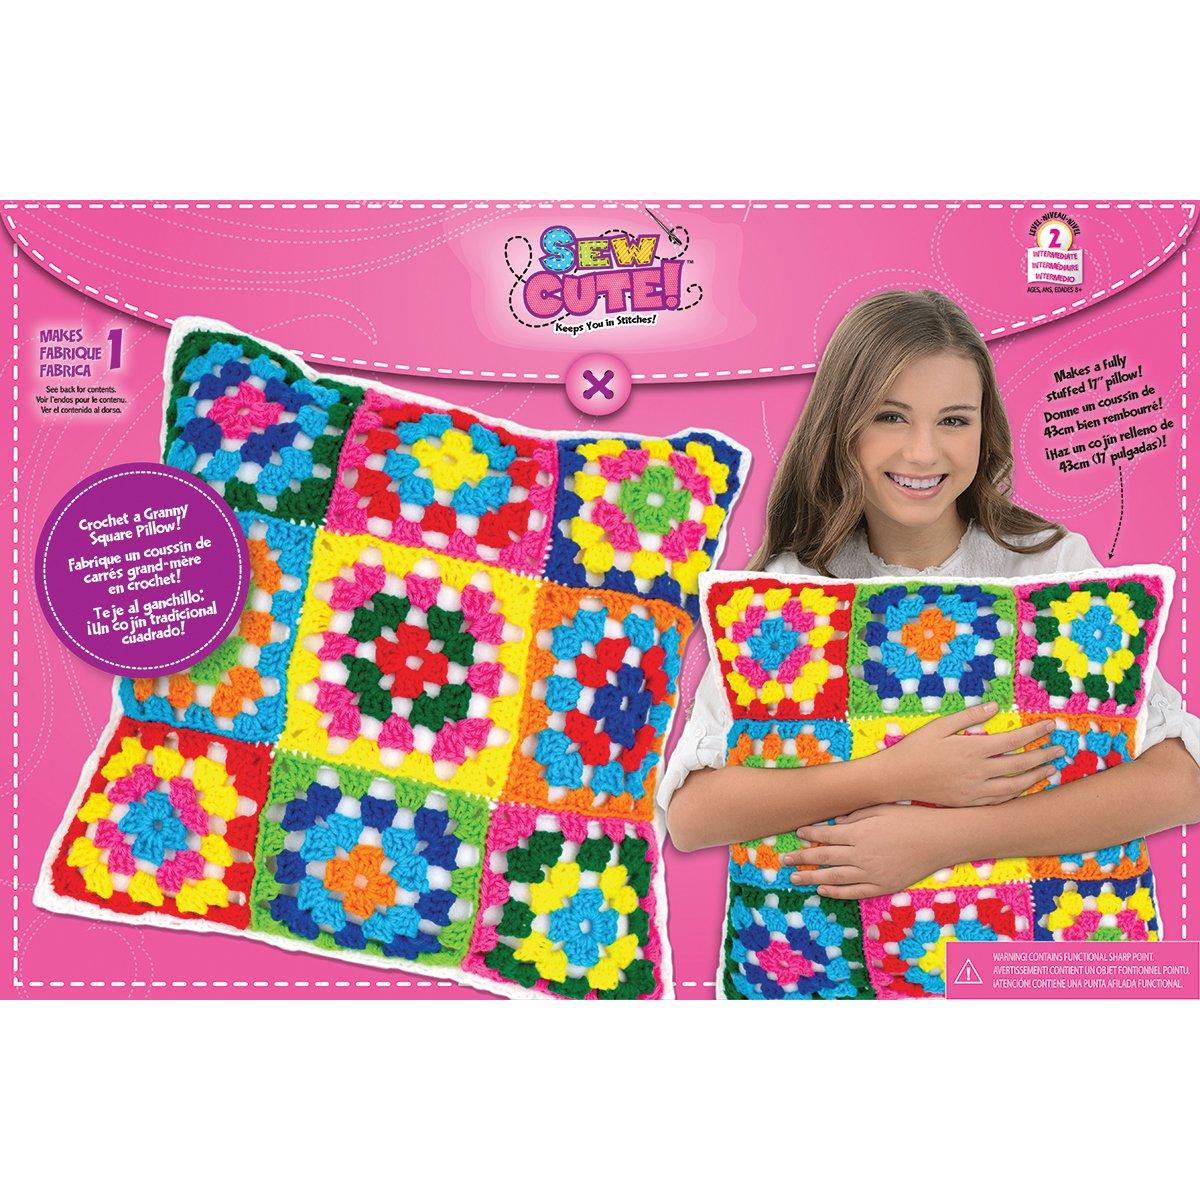 Colorbok Sew Cute Crochet Granny Squares Pillow